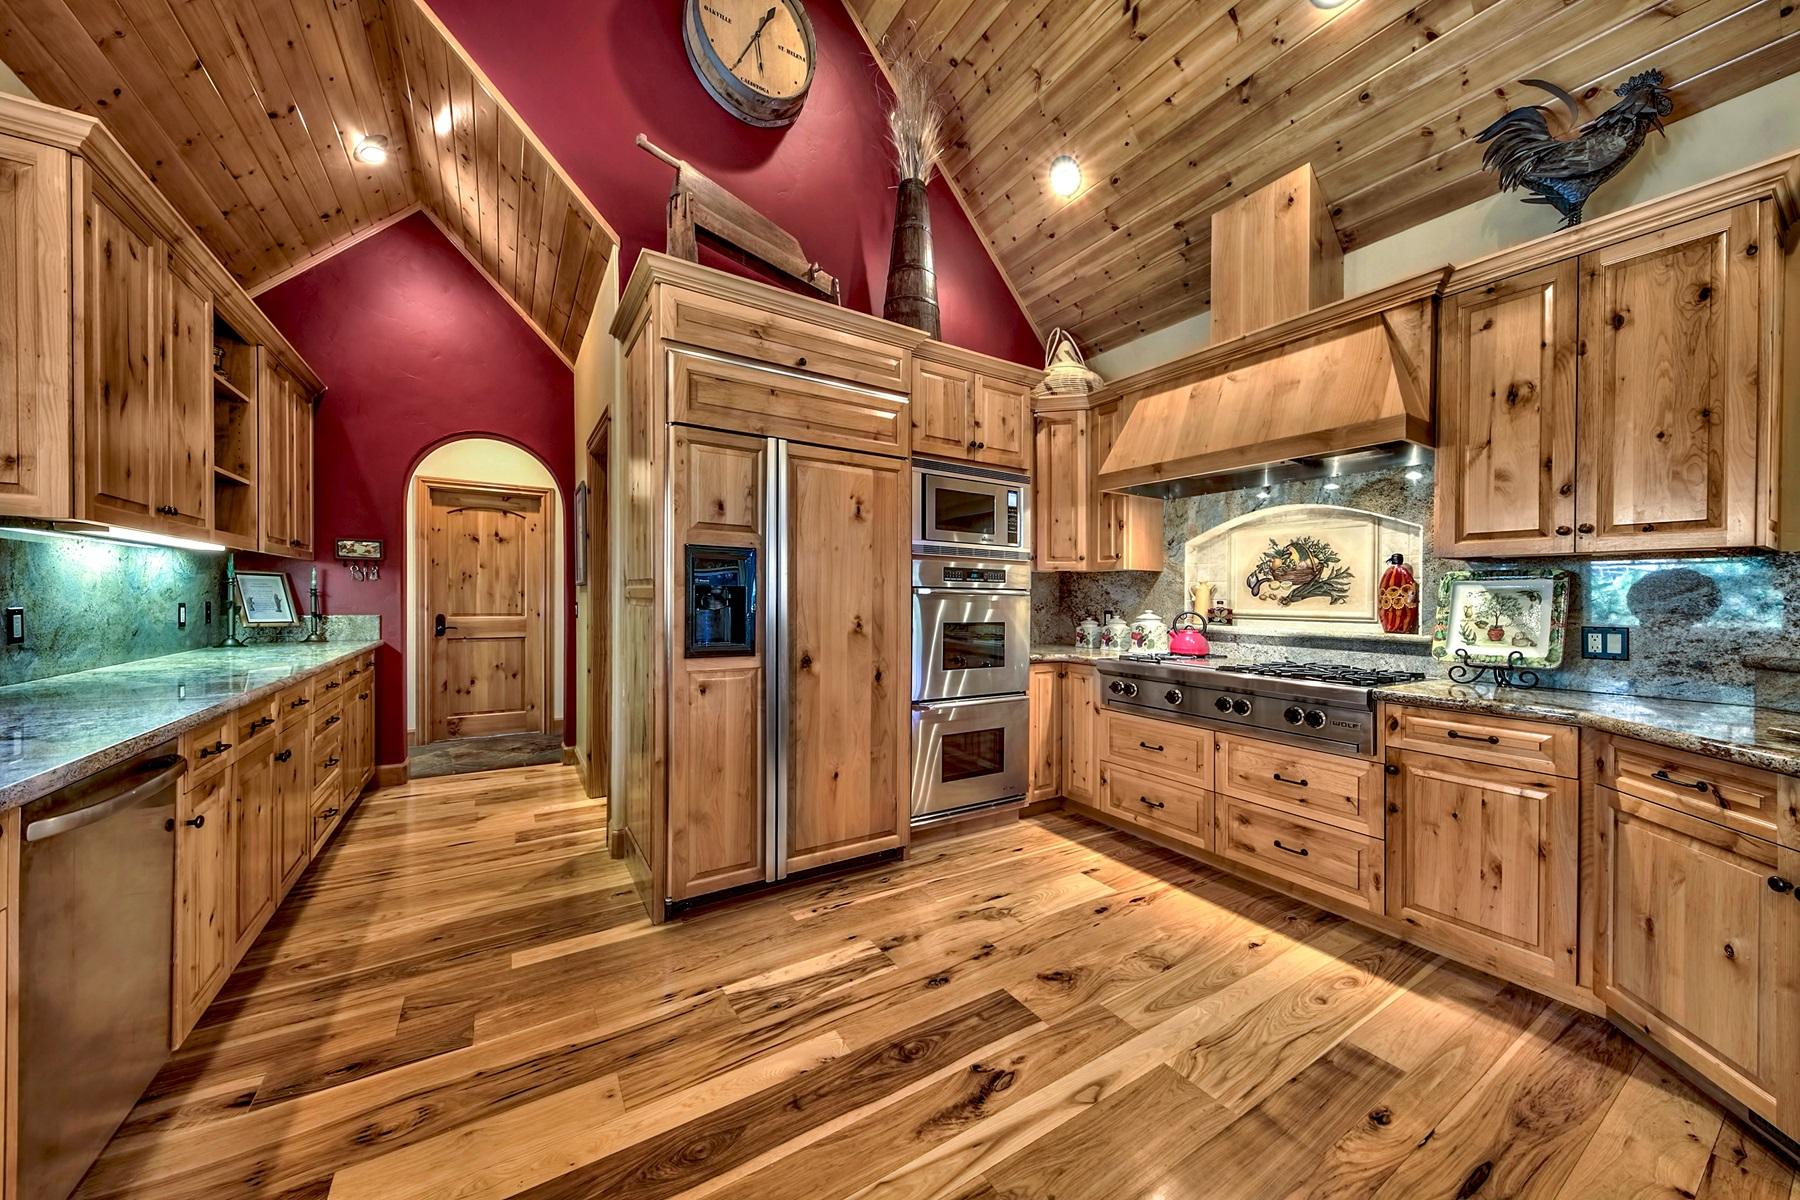 Additional photo for property listing at 578 Sunburst, Portola Ca 96122 578 Sunburst Portola, California 96122 United States